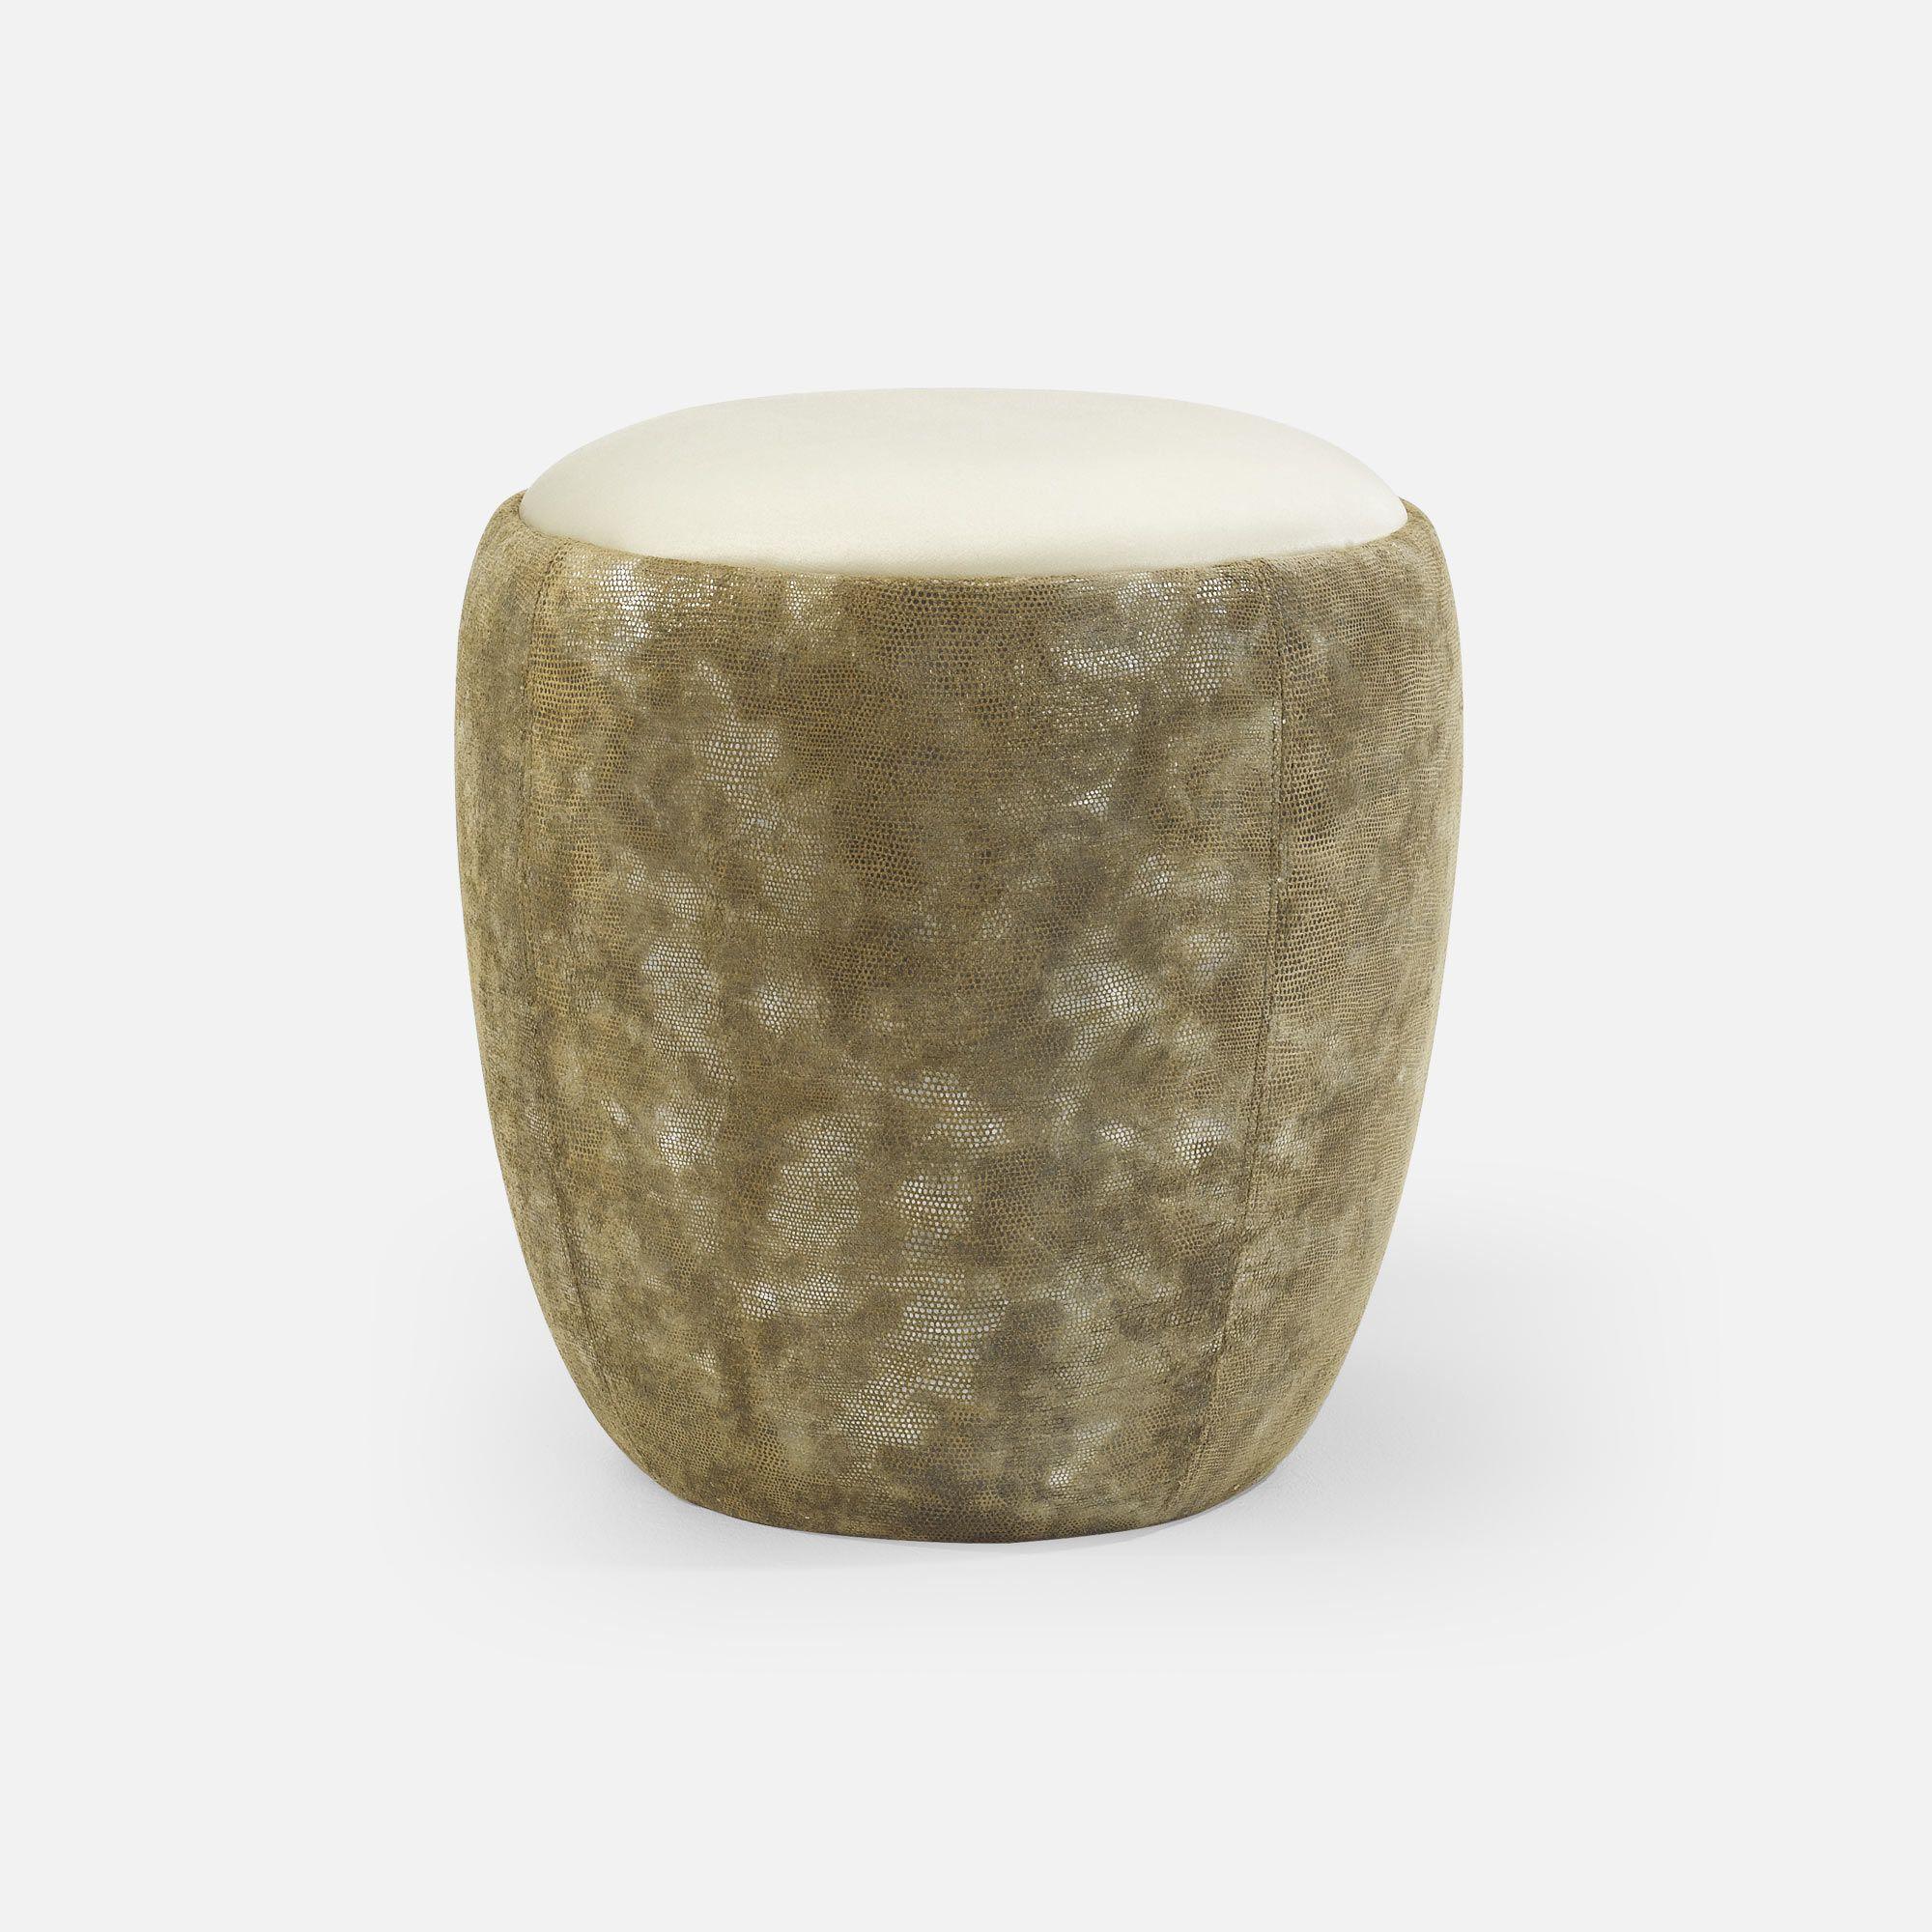 fabricant de sieges ref 6006 pouf tam tam collinet si ges. Black Bedroom Furniture Sets. Home Design Ideas